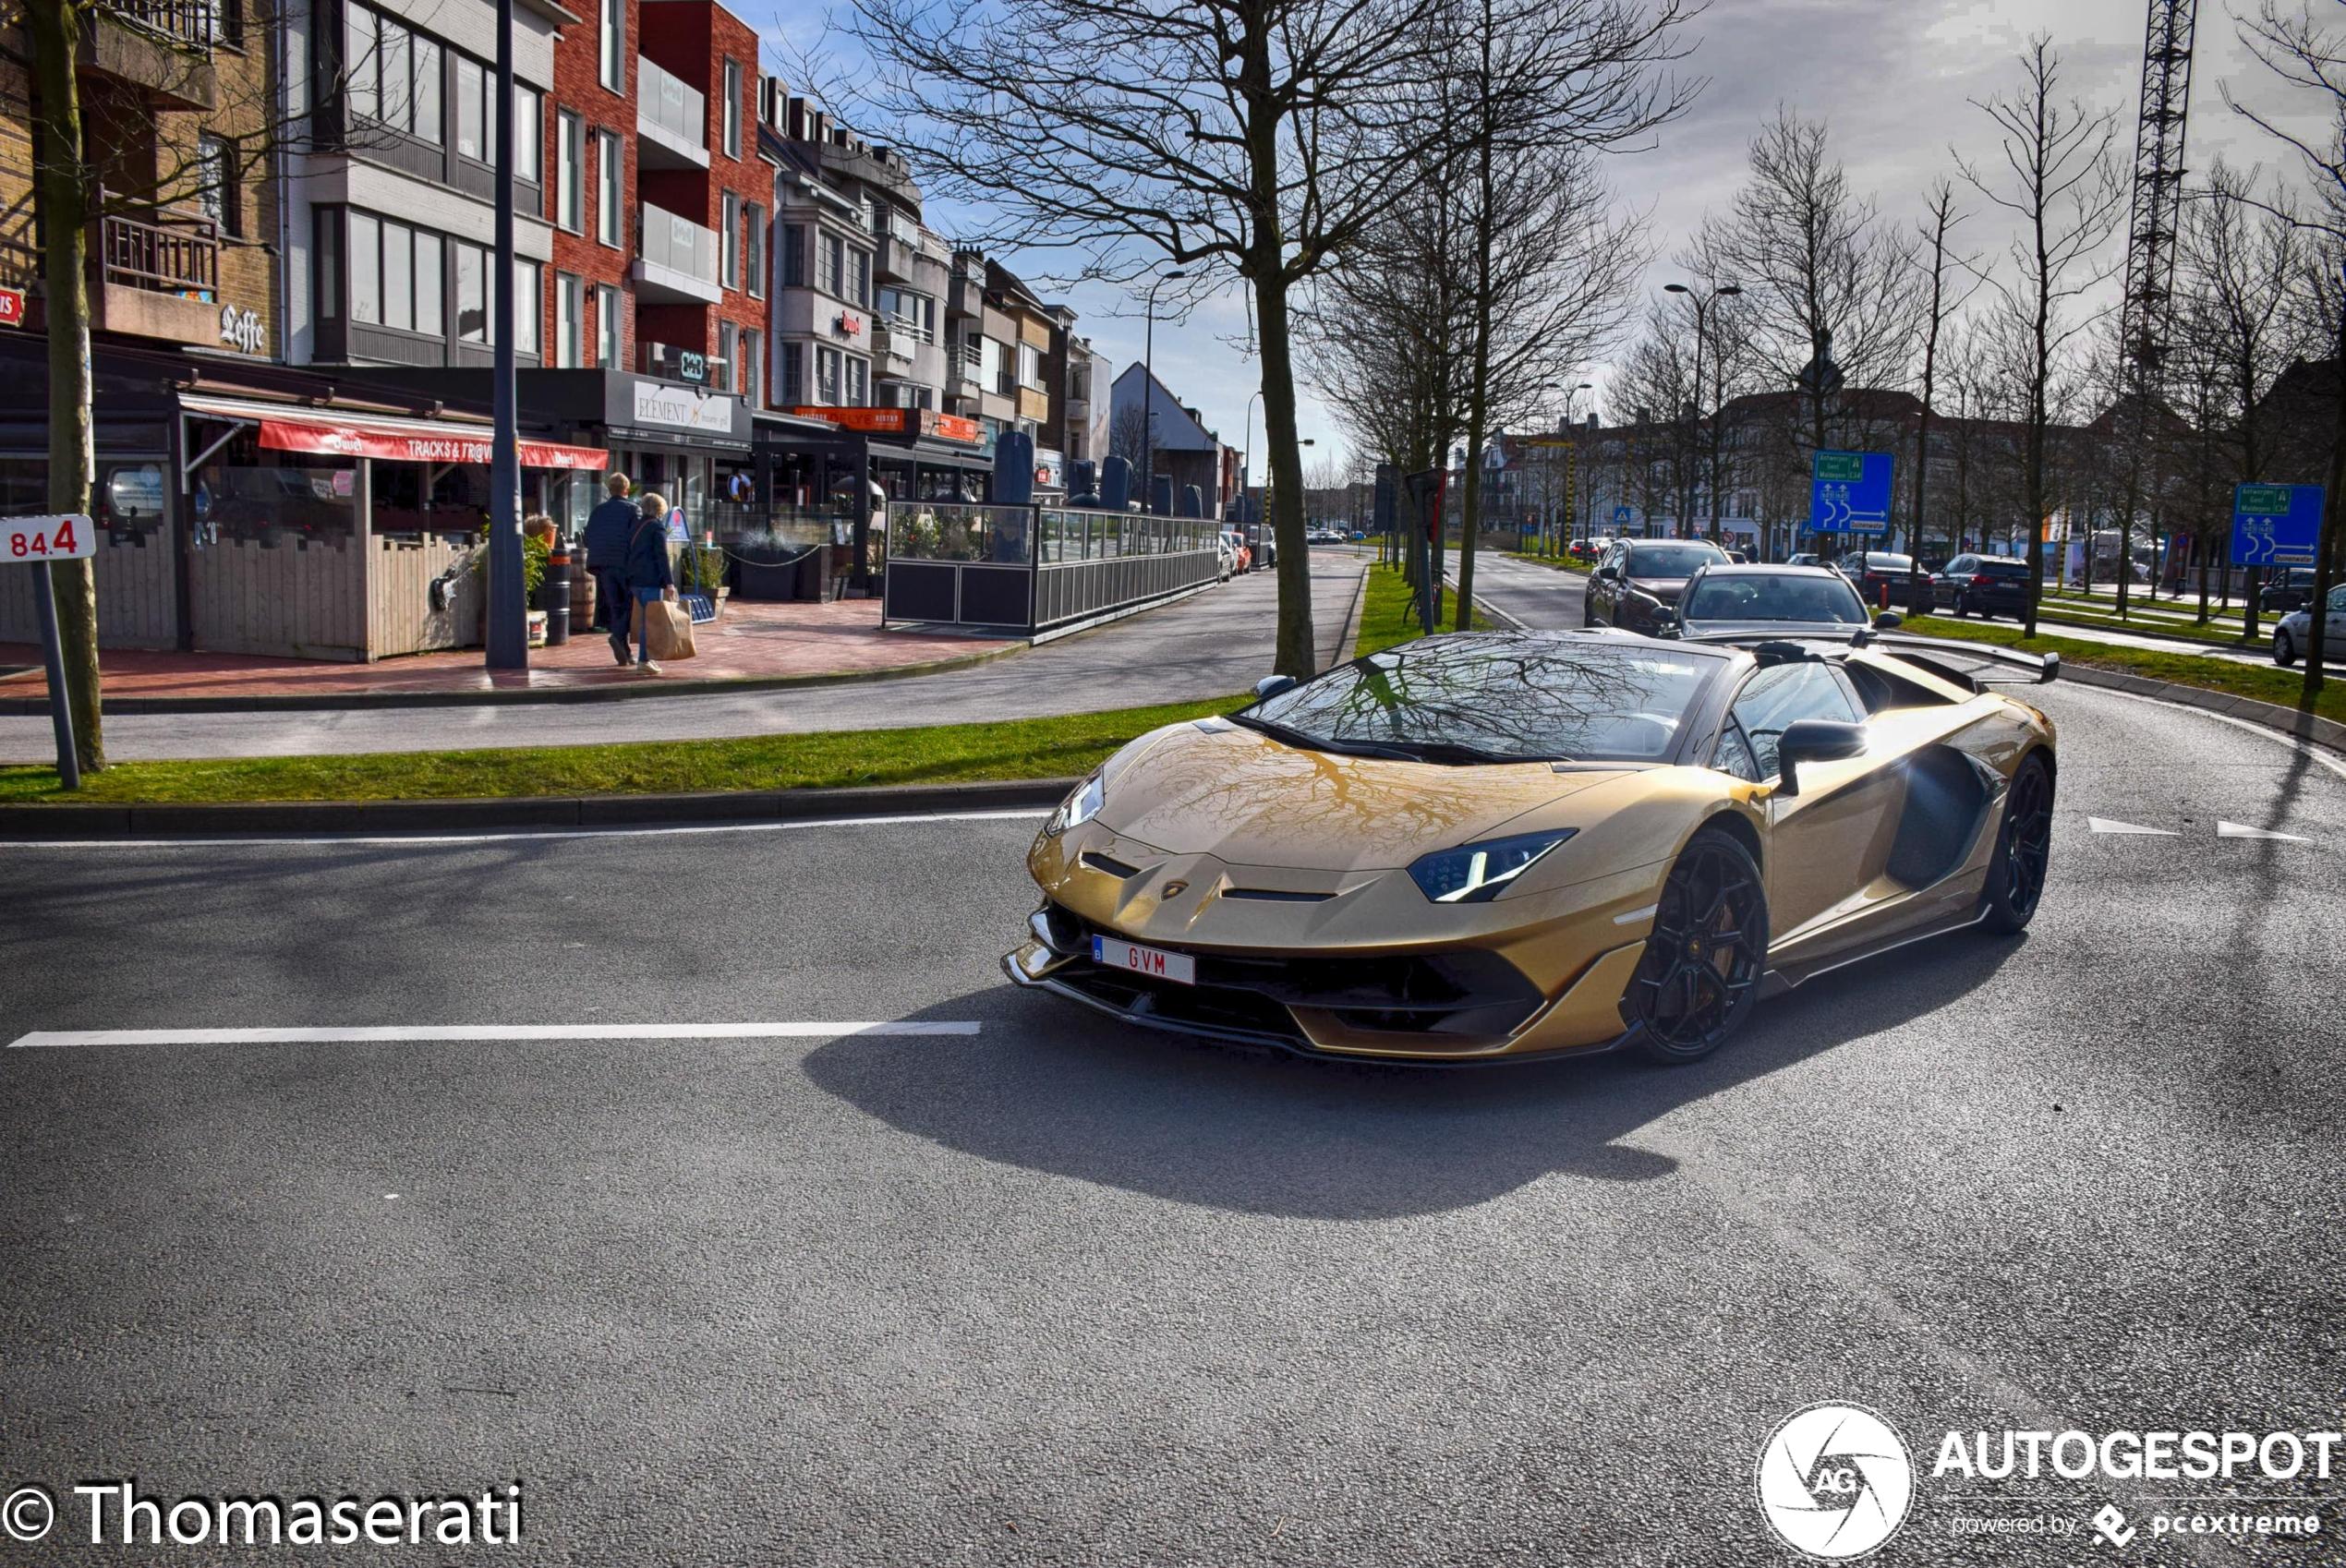 Lamborghini Aventador LP770-4 SVJ Roadster pakt volle aandacht in Knokke-Heist